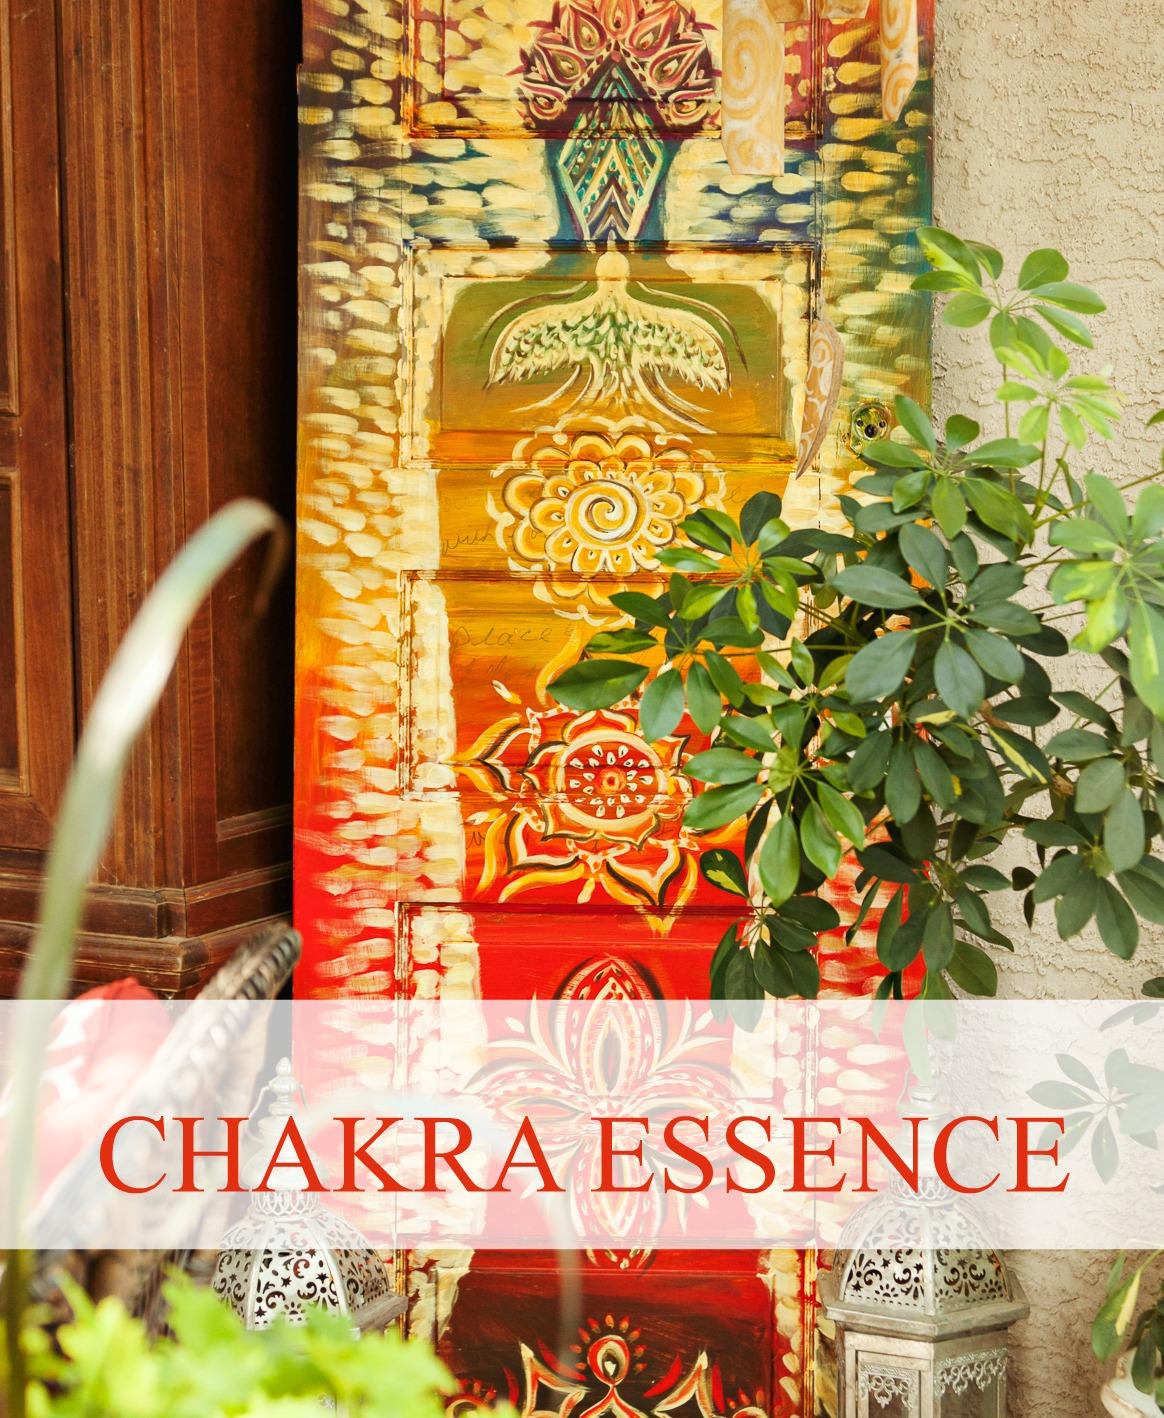 Chakra essence.jpg